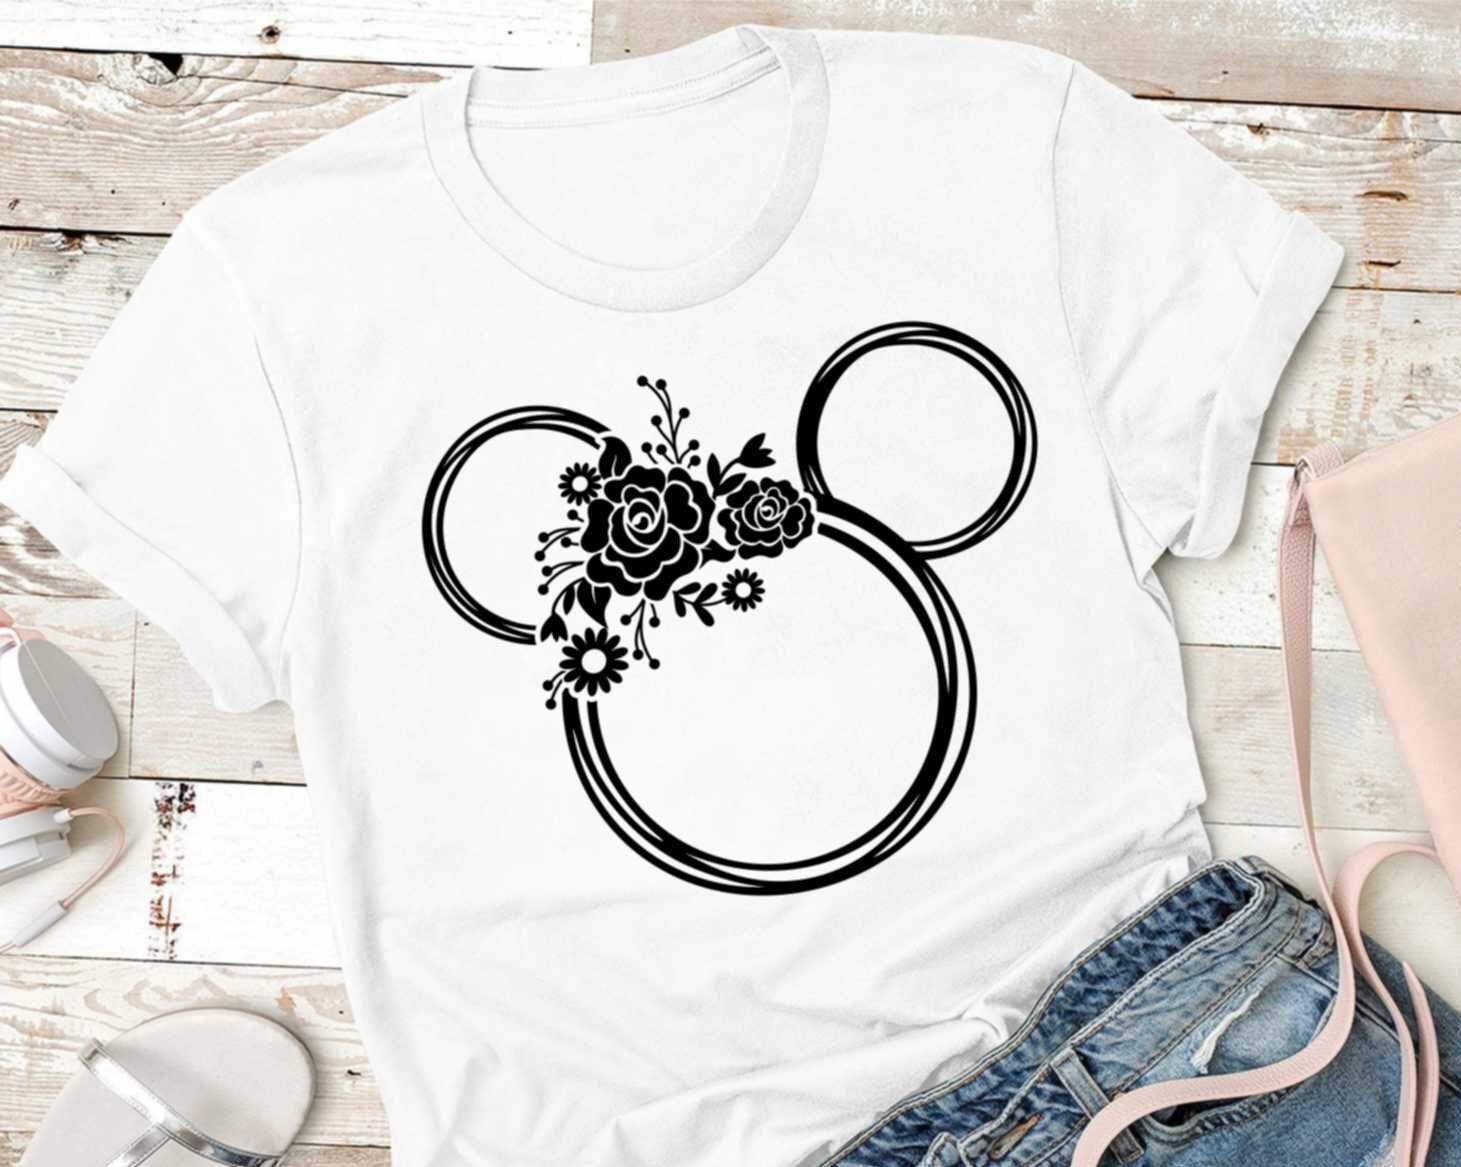 Disney  Marie  Aristocats  Magic Kingdom  Disney World  Disneyland  Mouse  T-Shirt  T Shirt  Tee  Shirt  Girls  Mickey  Minnie